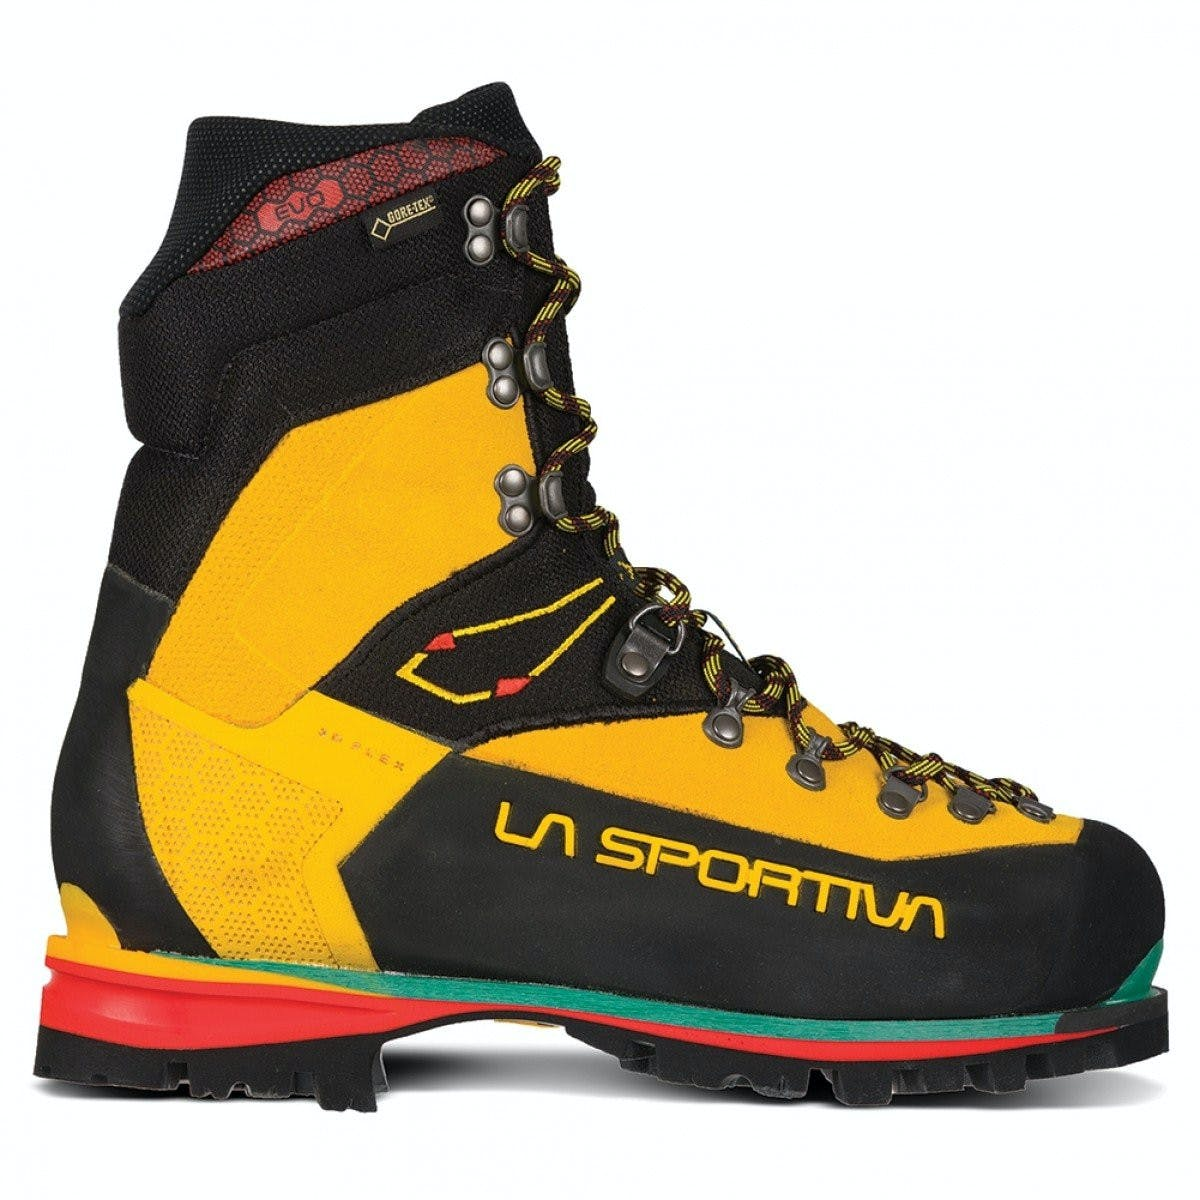 LA SPORTIVA - NEPAL EVO GTX MENS - 38.5 - Yellow